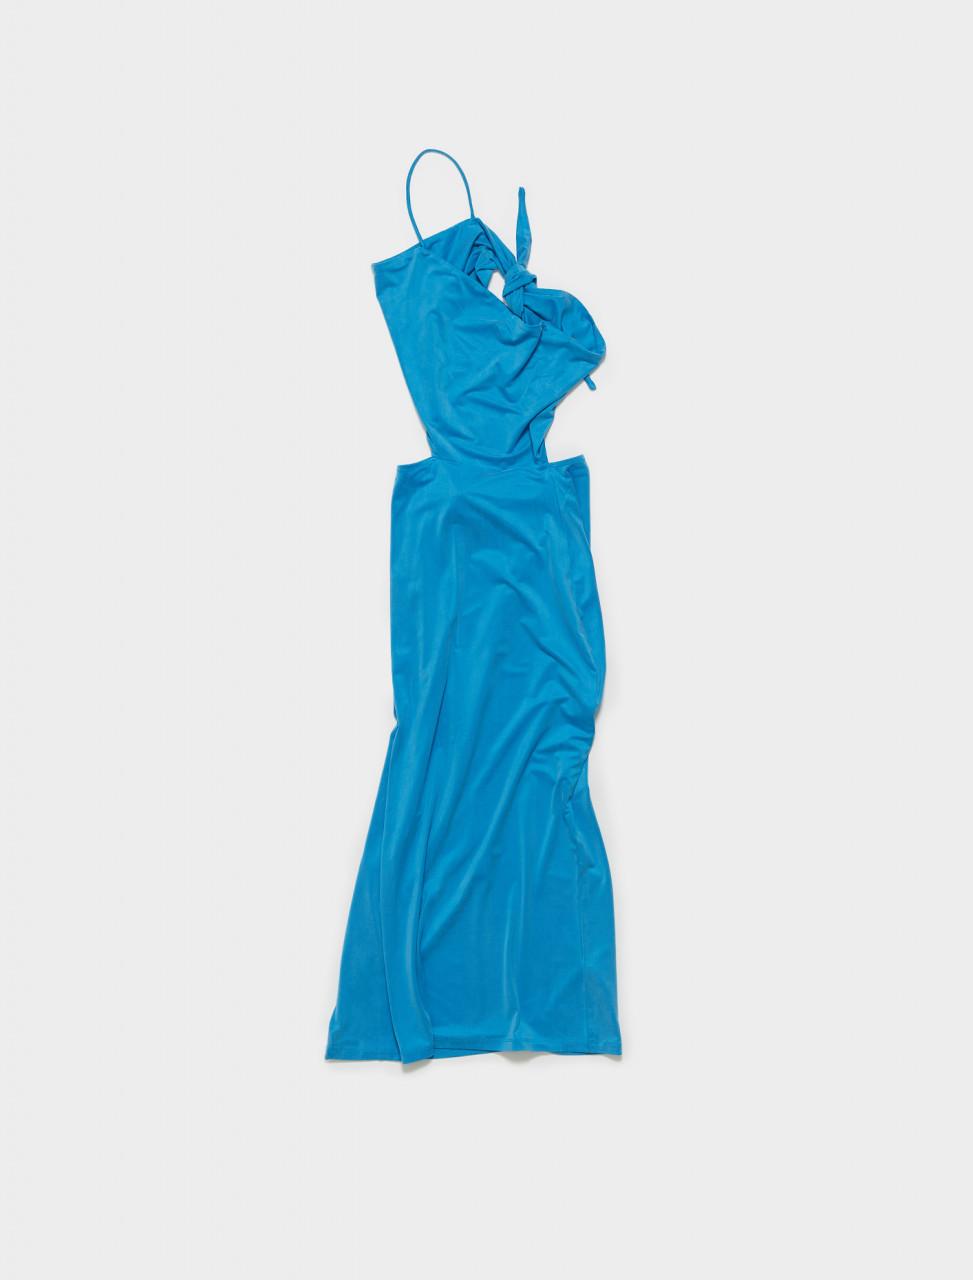 PJM015-119 PALOMA WOOL SAY ASYMMETRIC DRESS IN SOFT BLUE